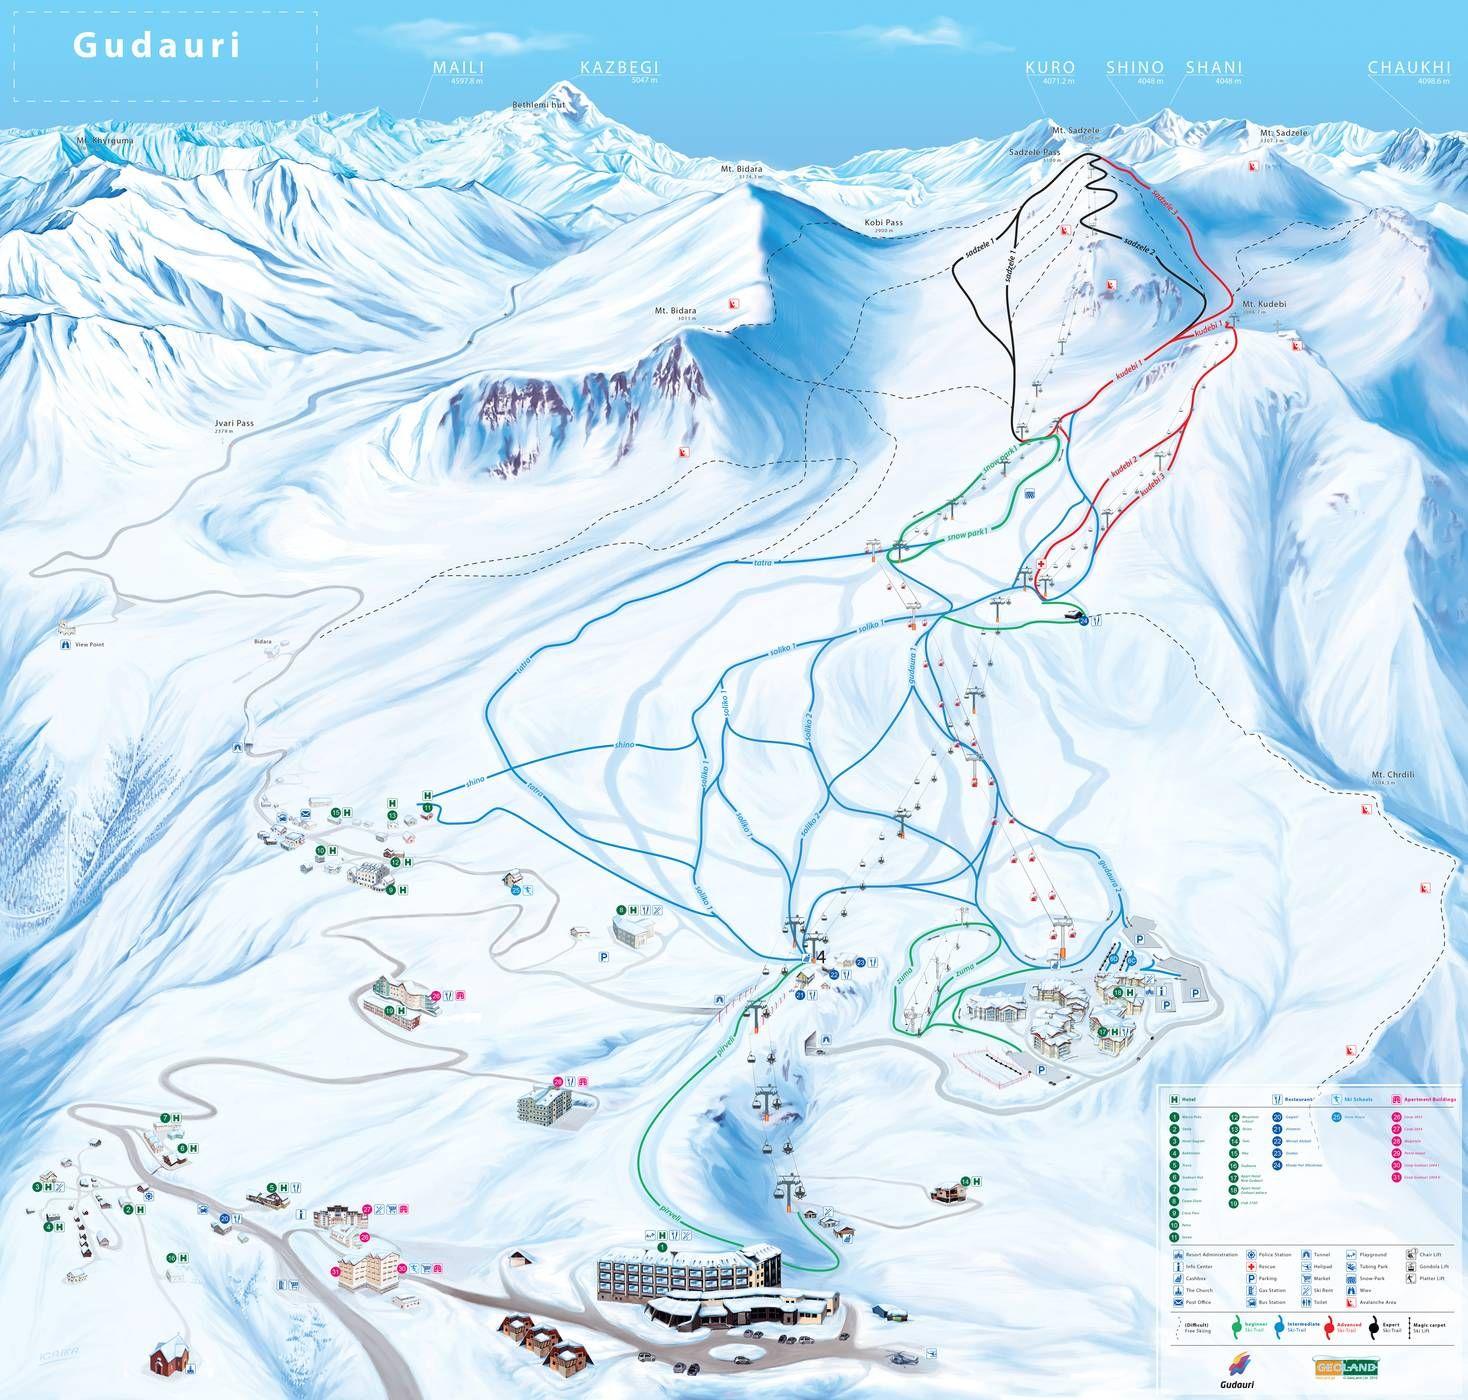 Gudauri Georgia Skiurlaub Skigebiete Reisen